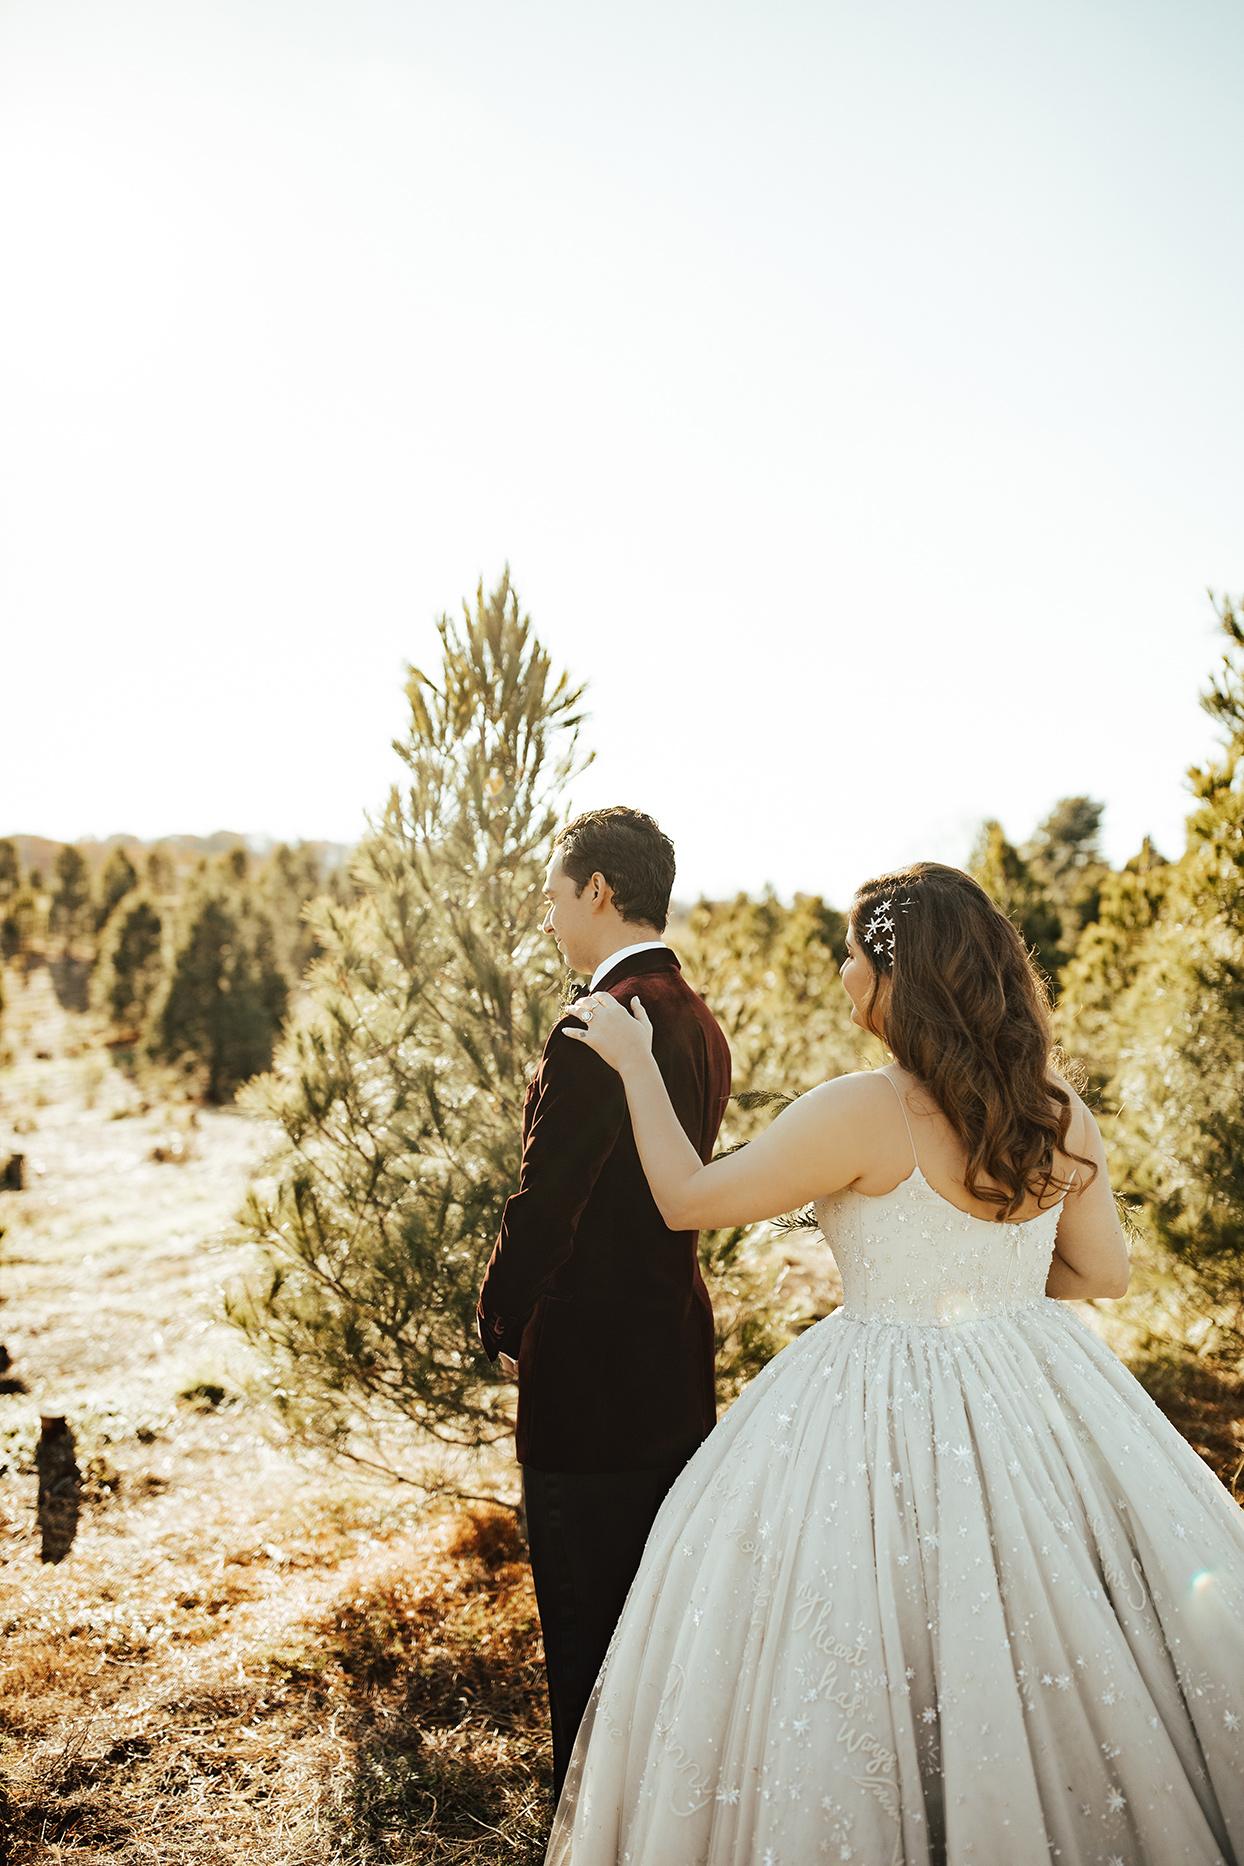 noelle danny wedding first look on tree farm